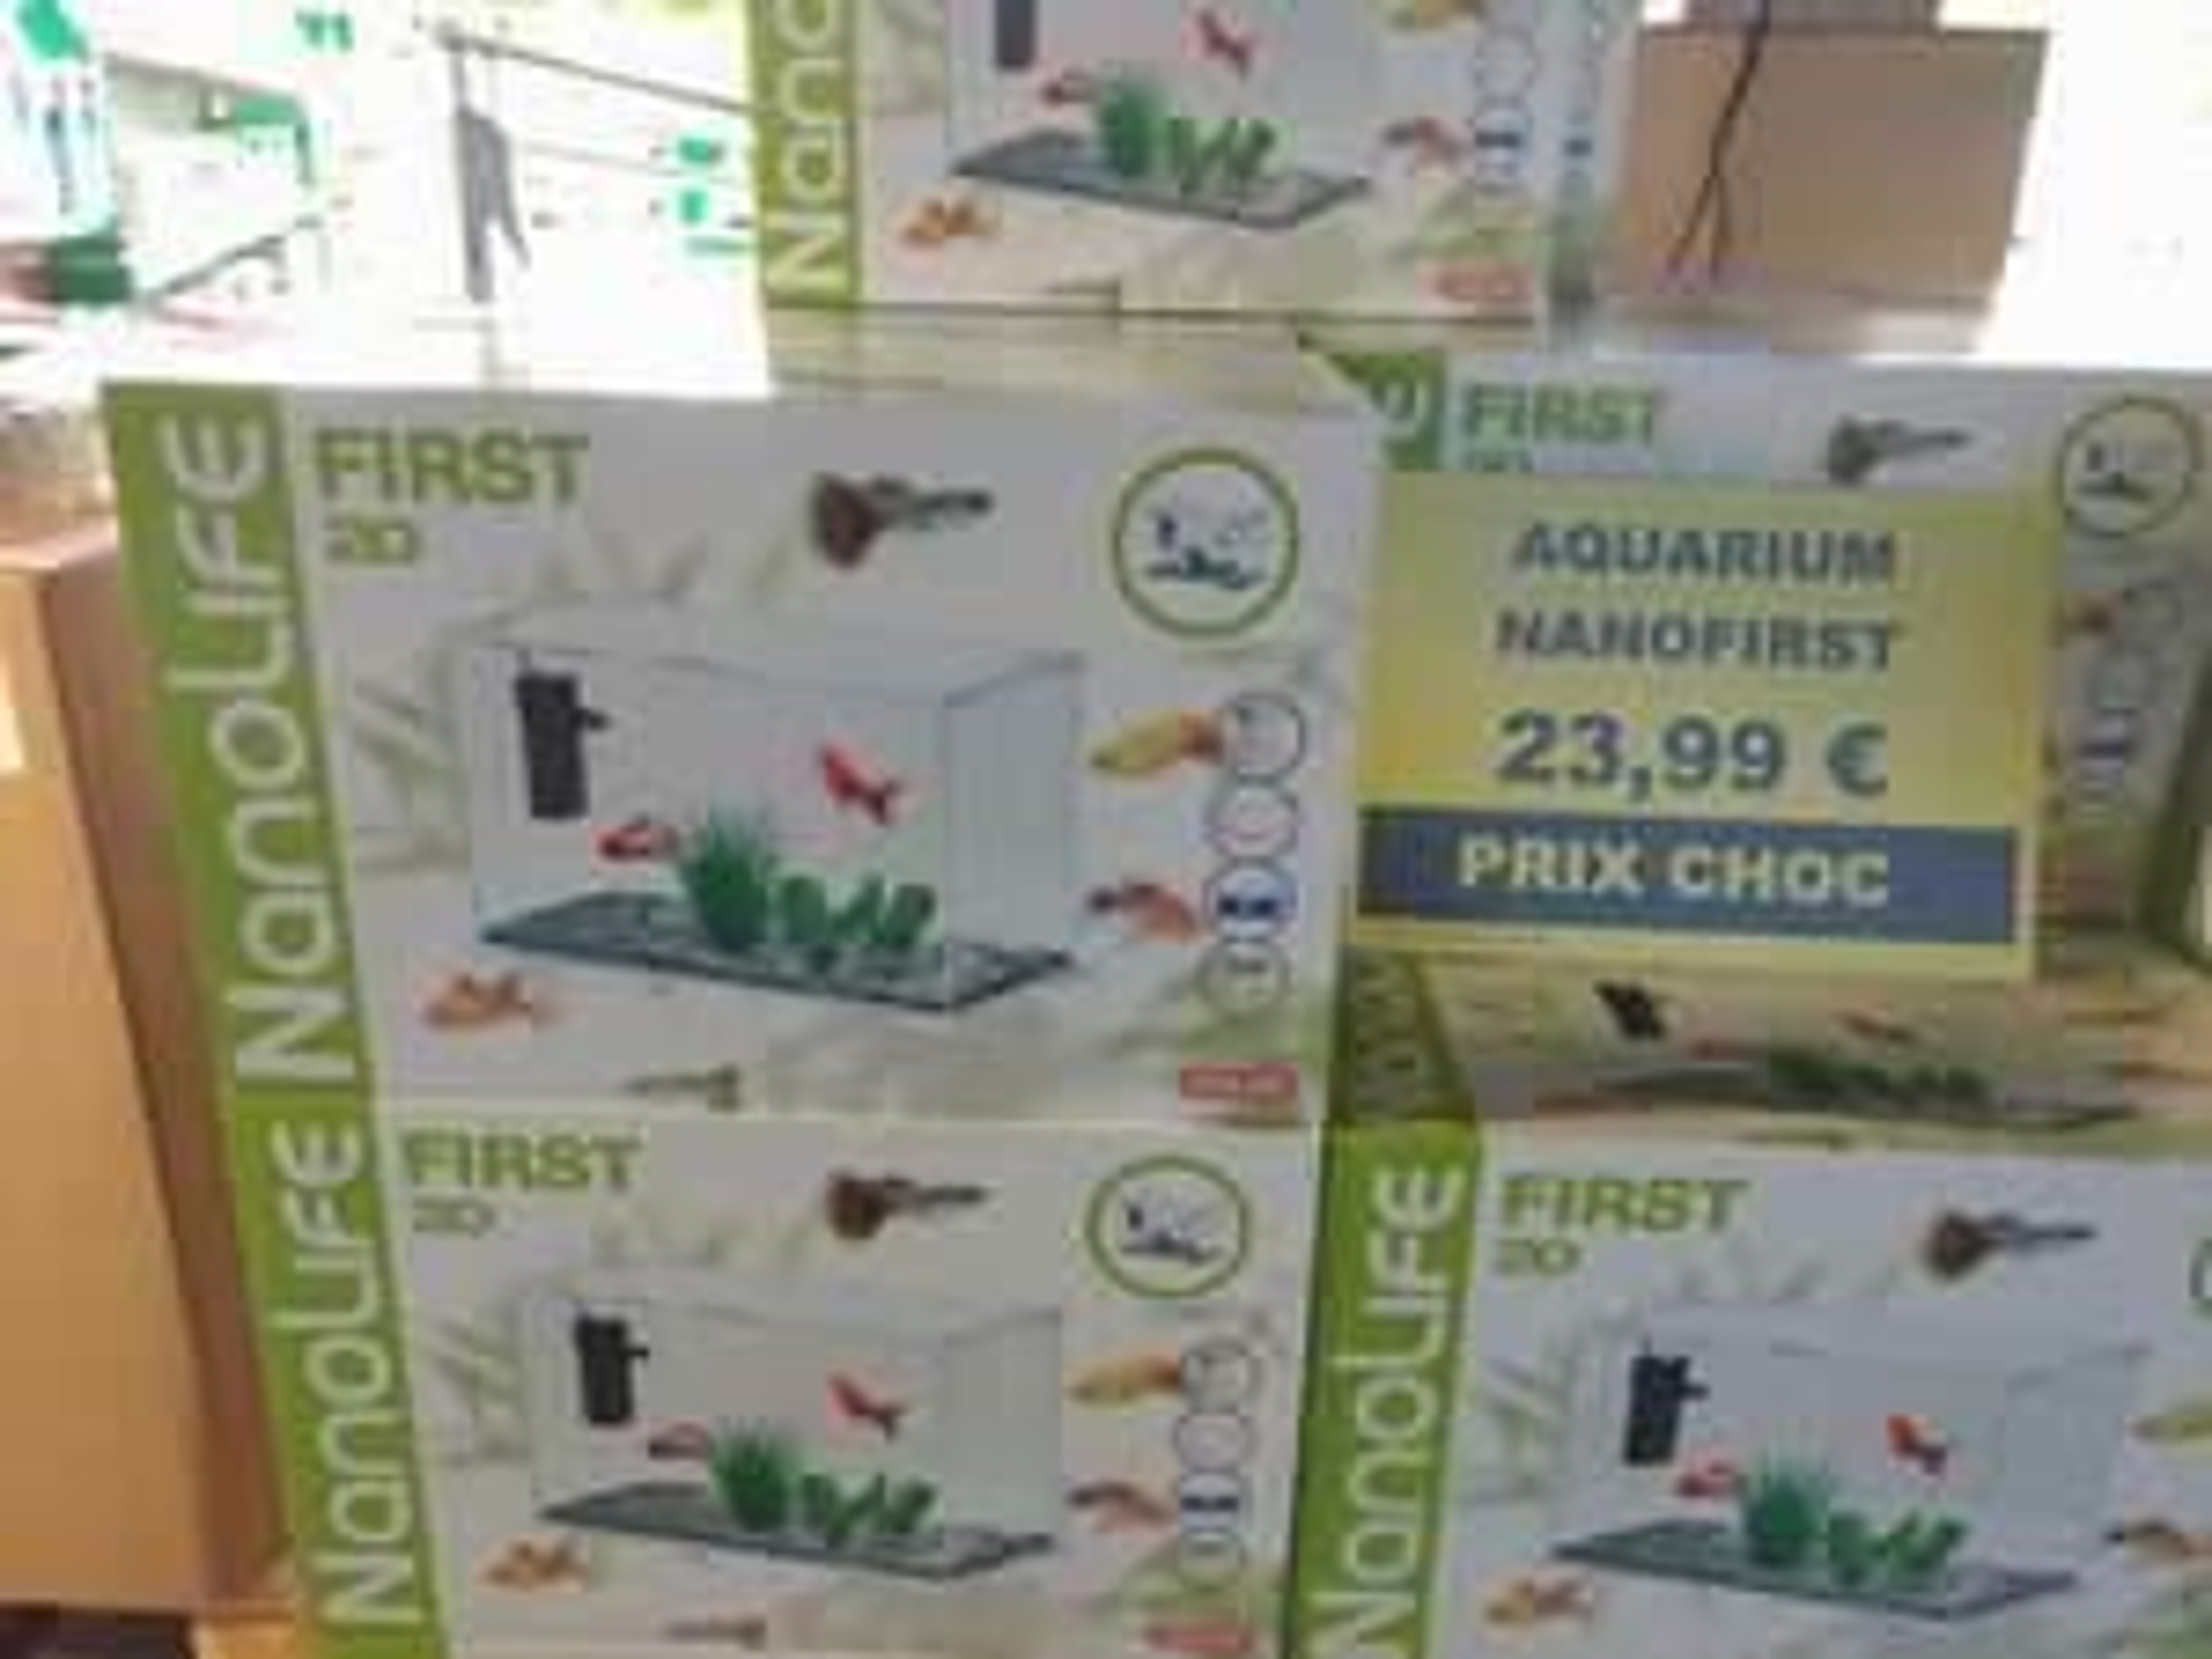 Aquarium Nanofirst - Échirolles Comboire (38)